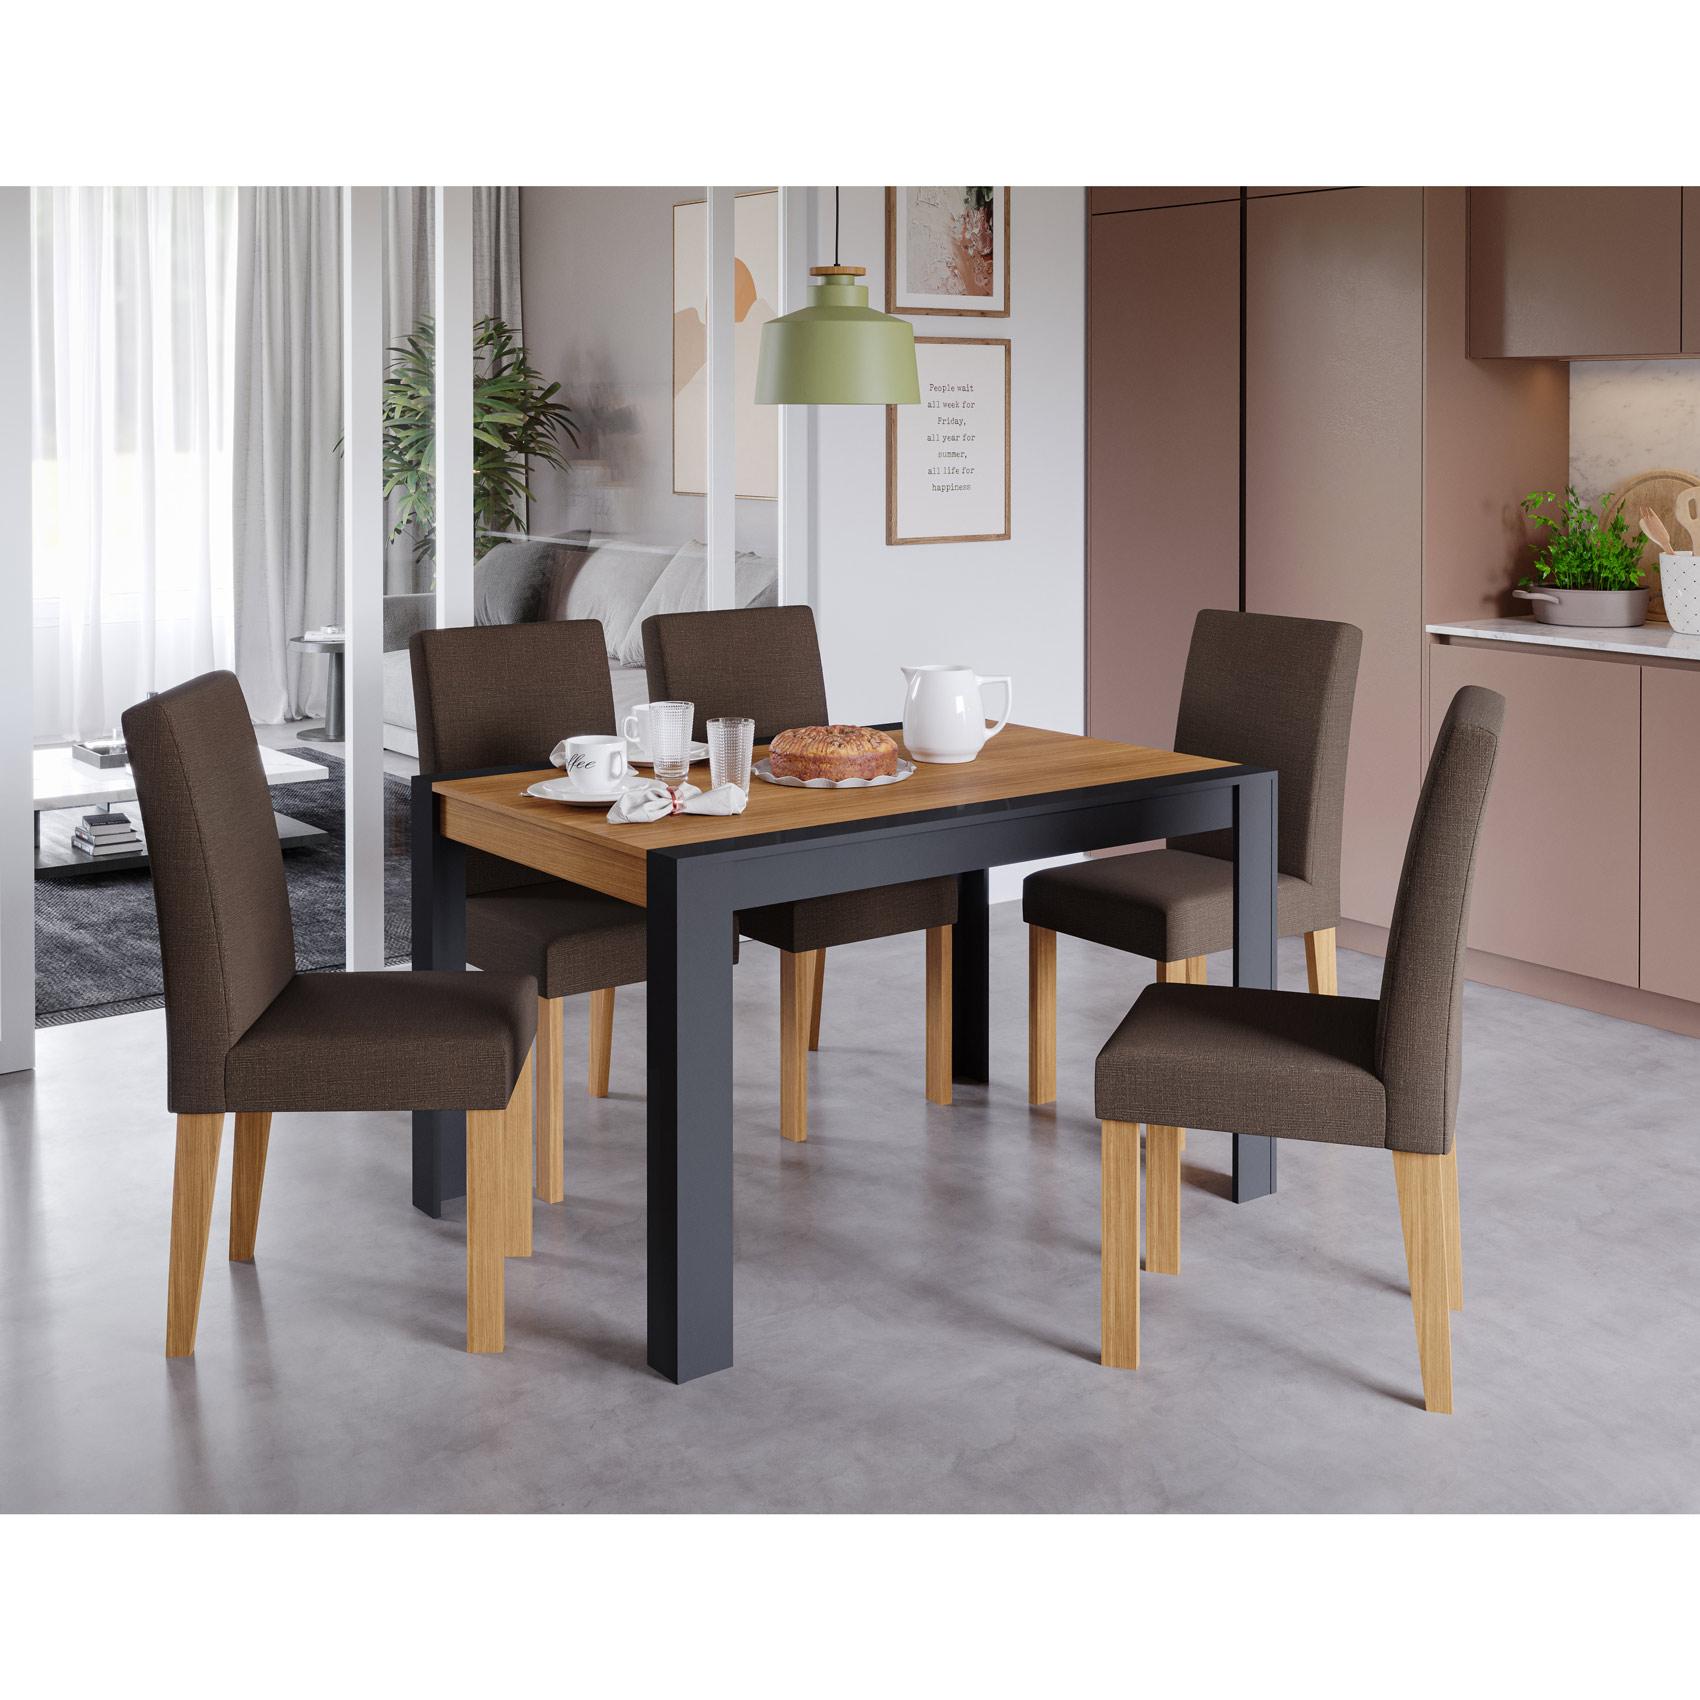 Mesa para Sala de Jantar Grace 130 x 90 cm 100% MDF e 6 Cadeiras Maia Cimol Chumbo/Nature/Mascavo